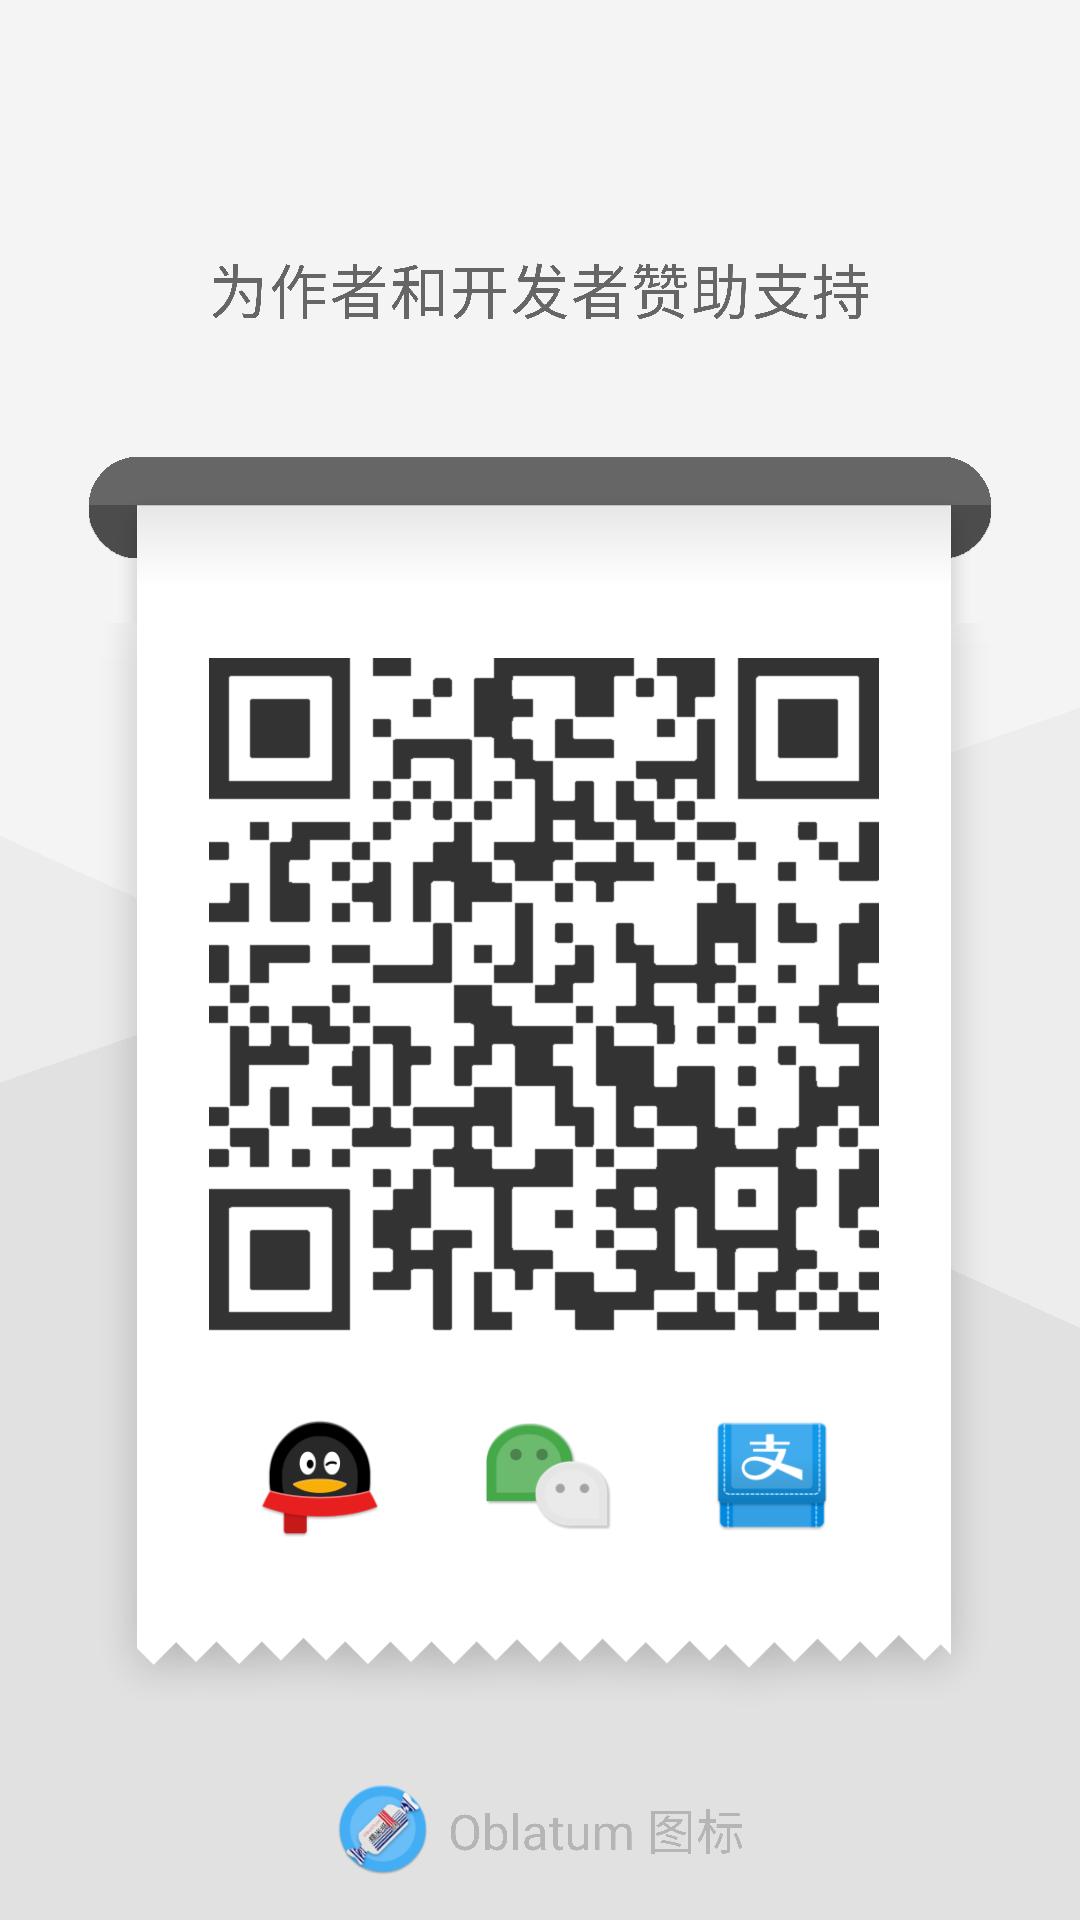 Oblatum 图标V1.5.2 安卓版